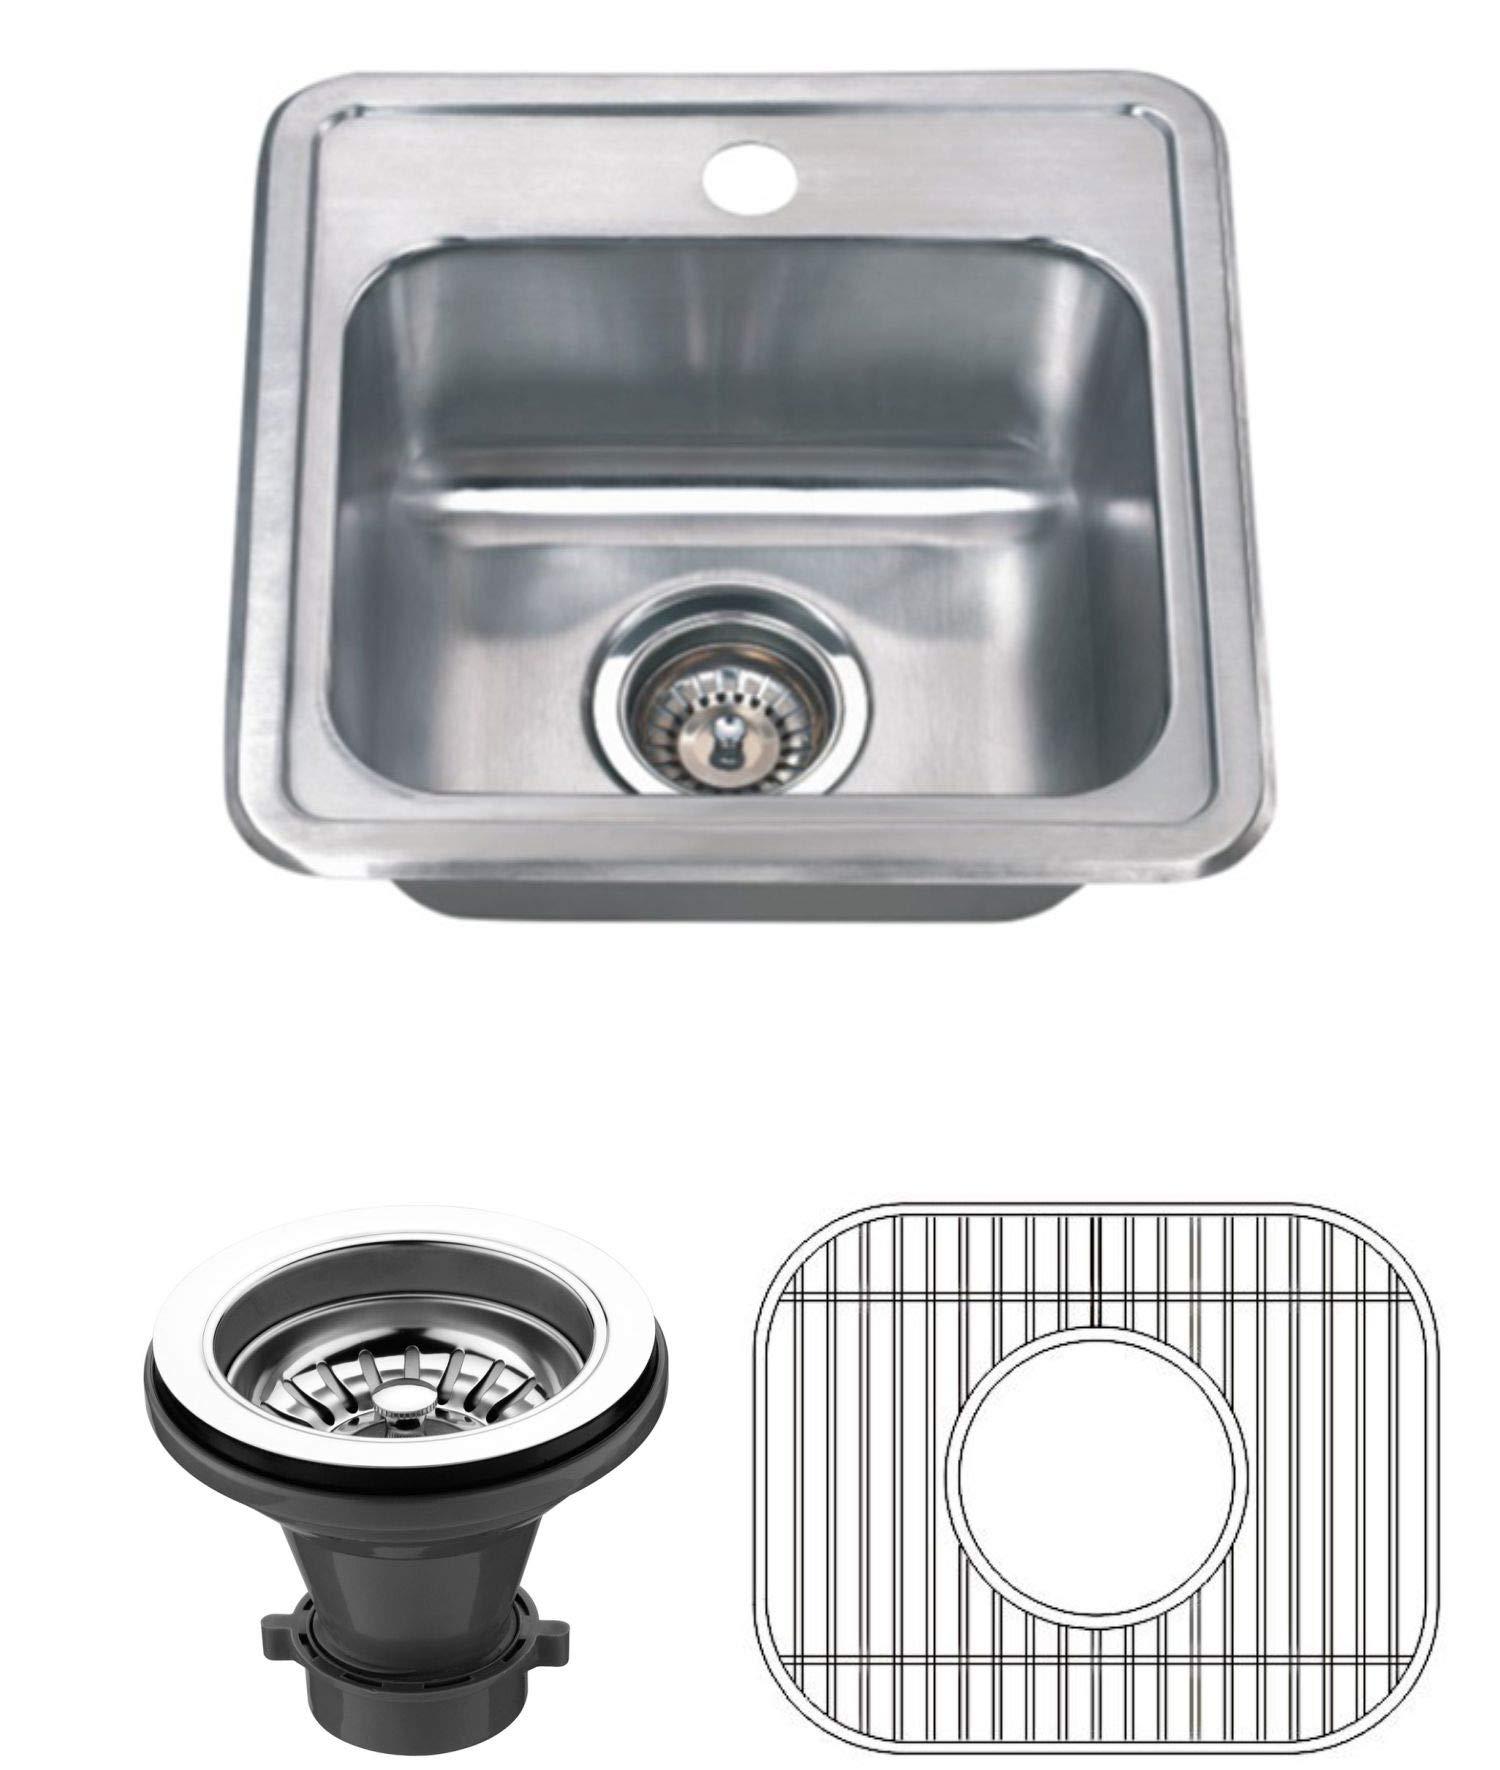 Wells Sinkware CMT1515-6-1 22 gauge Single Bowl Top-Mount Kitchen Sink Package, Stainless Steel by Wells Sinkware